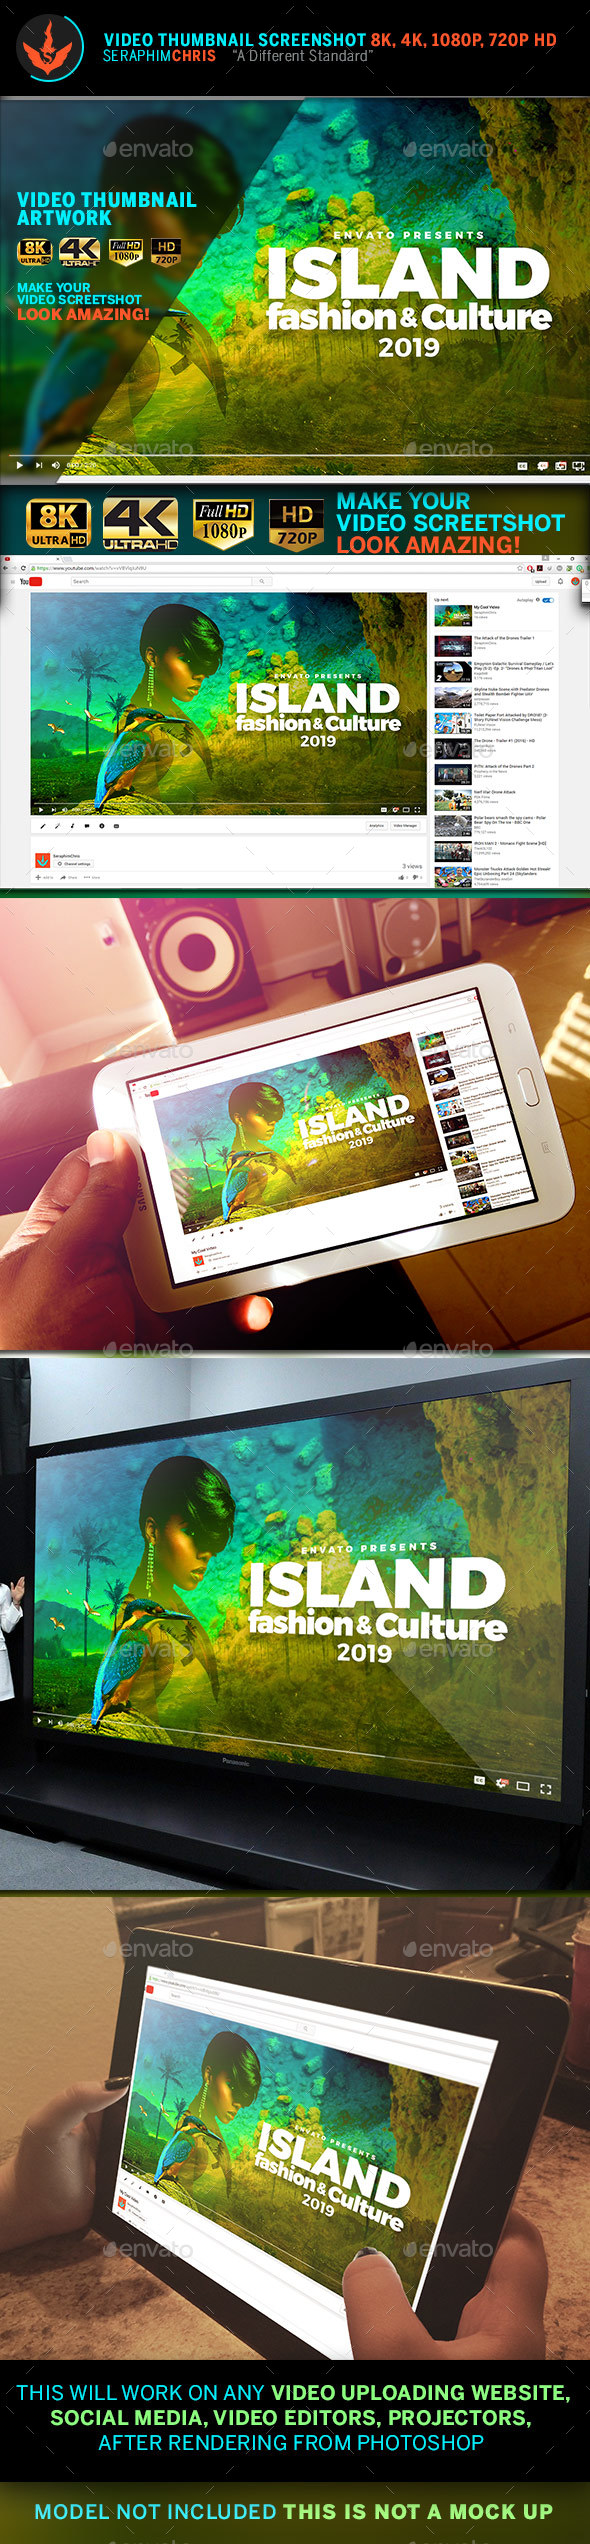 Caribbean YouTube Video Thumbnail Screenshot Template - YouTube Social Media